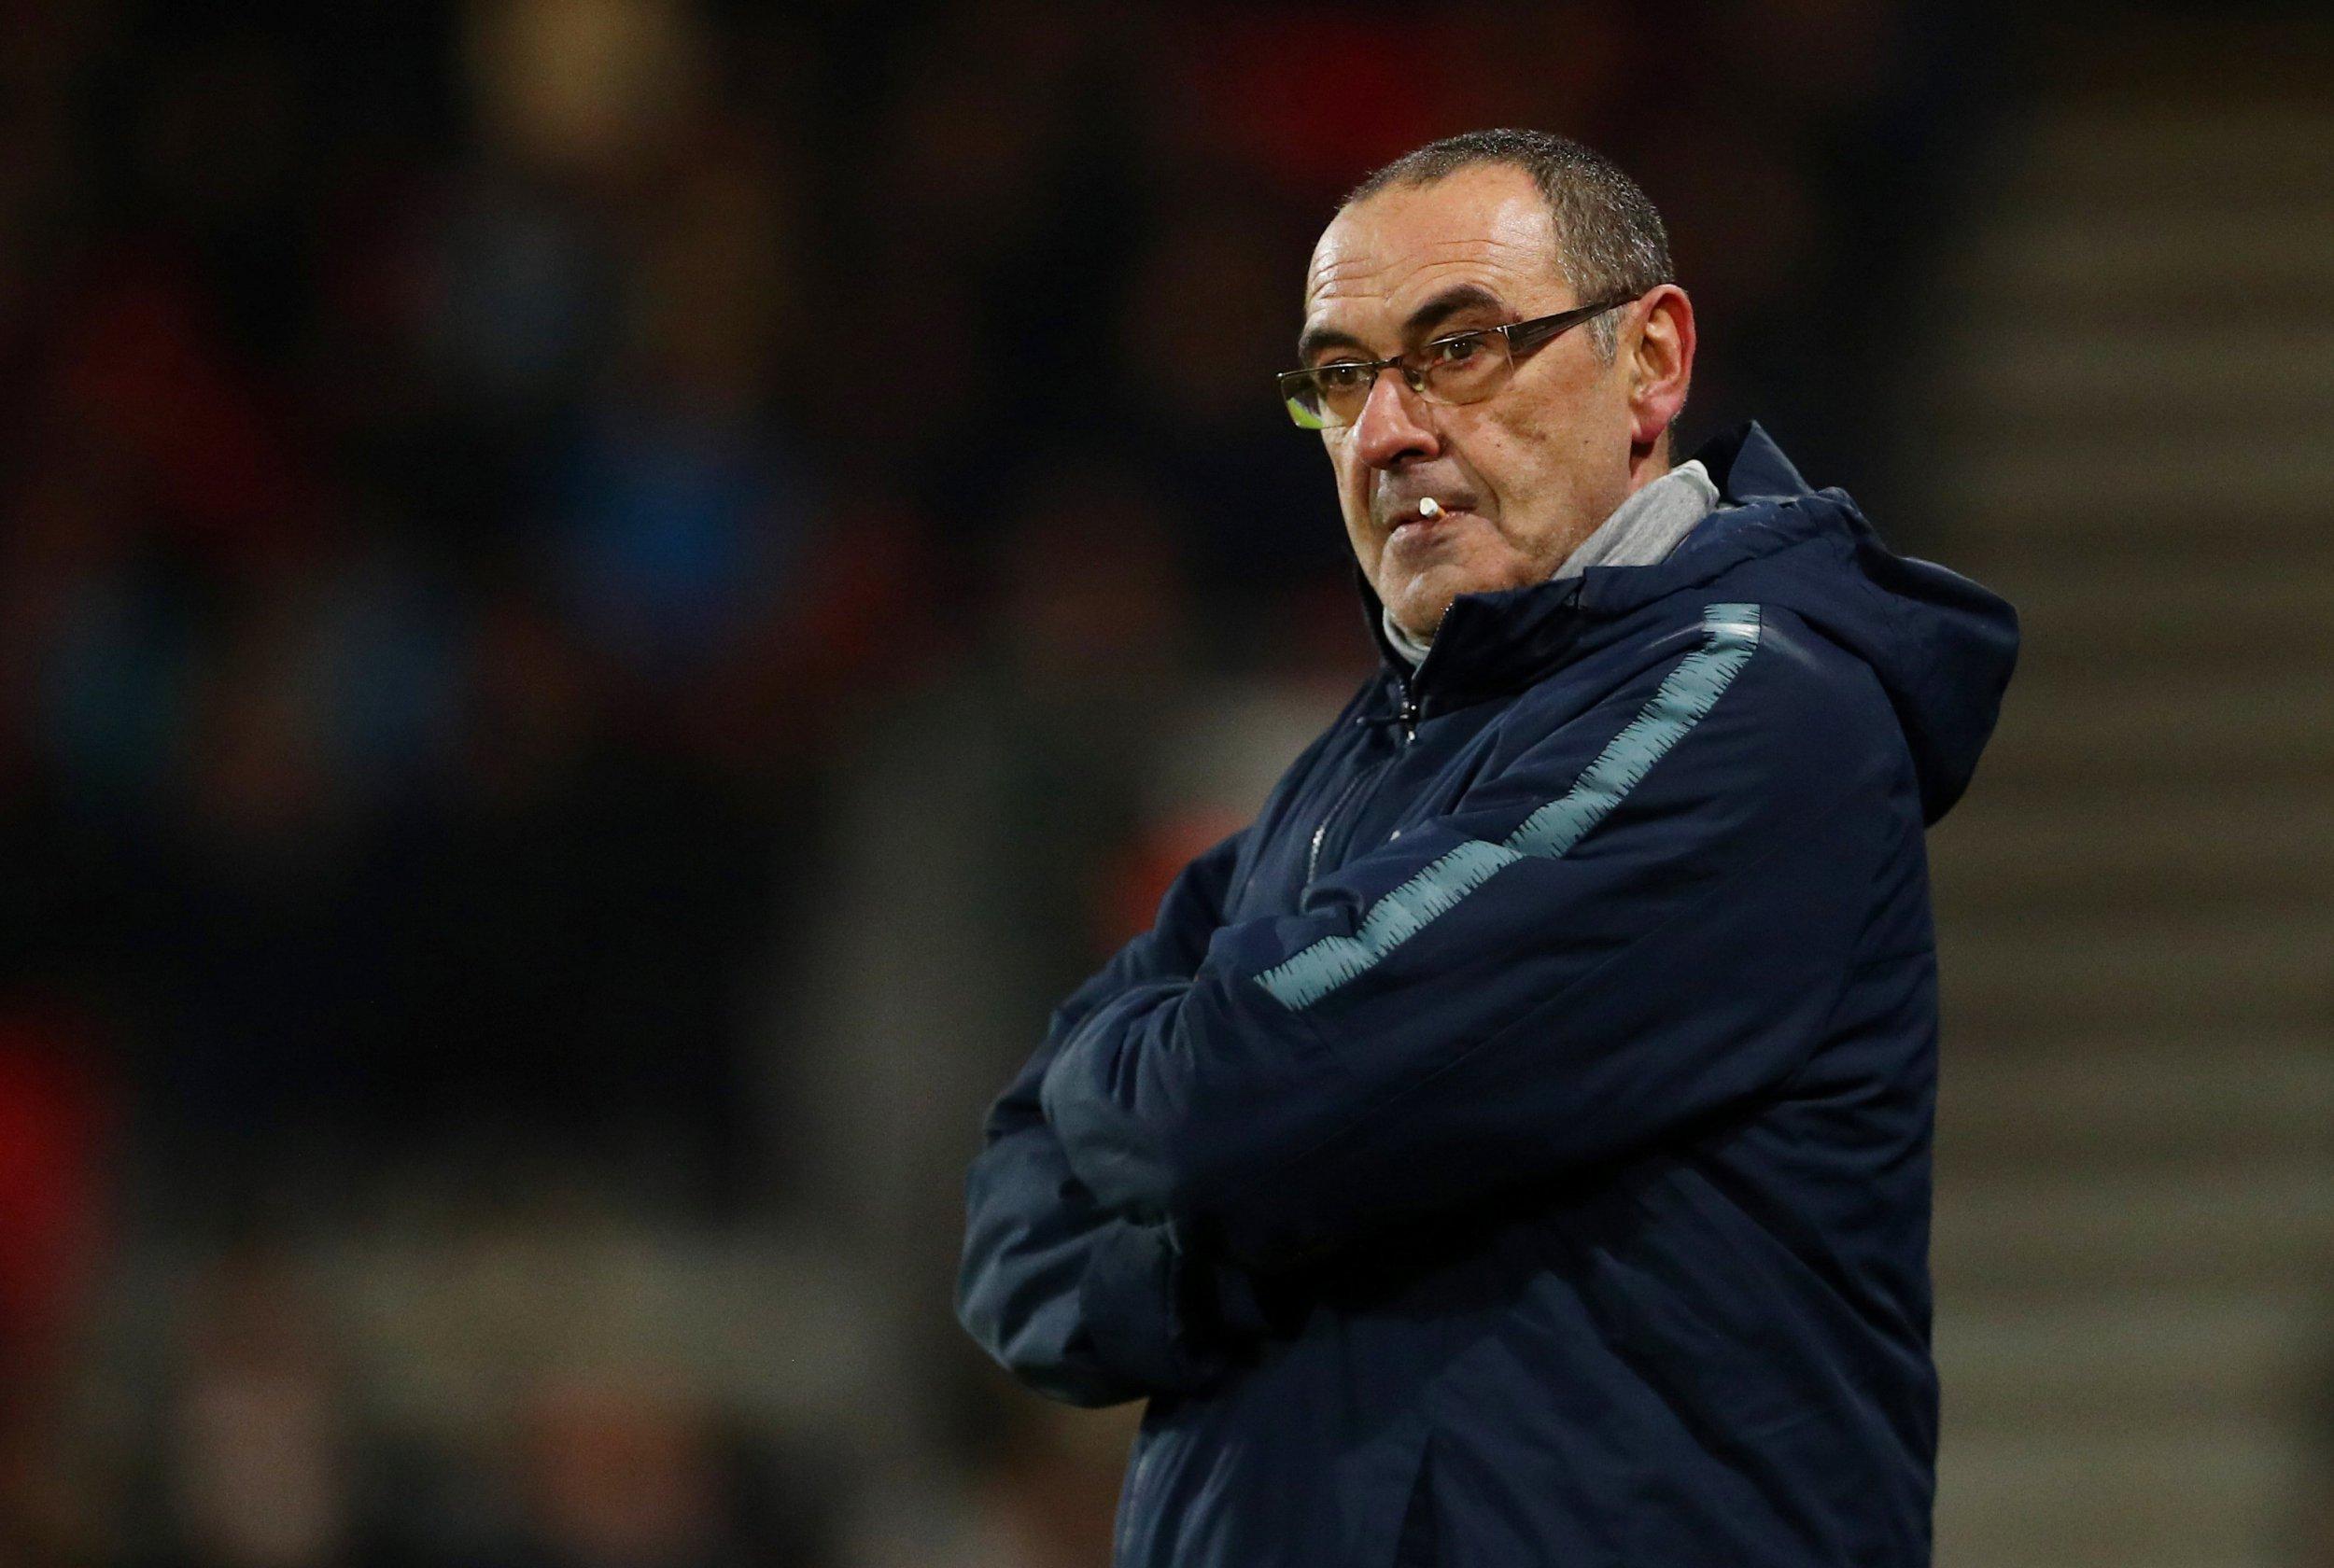 Maurizio Sarri dismisses Jorginho fears ahead of Chelsea's trip to Man City